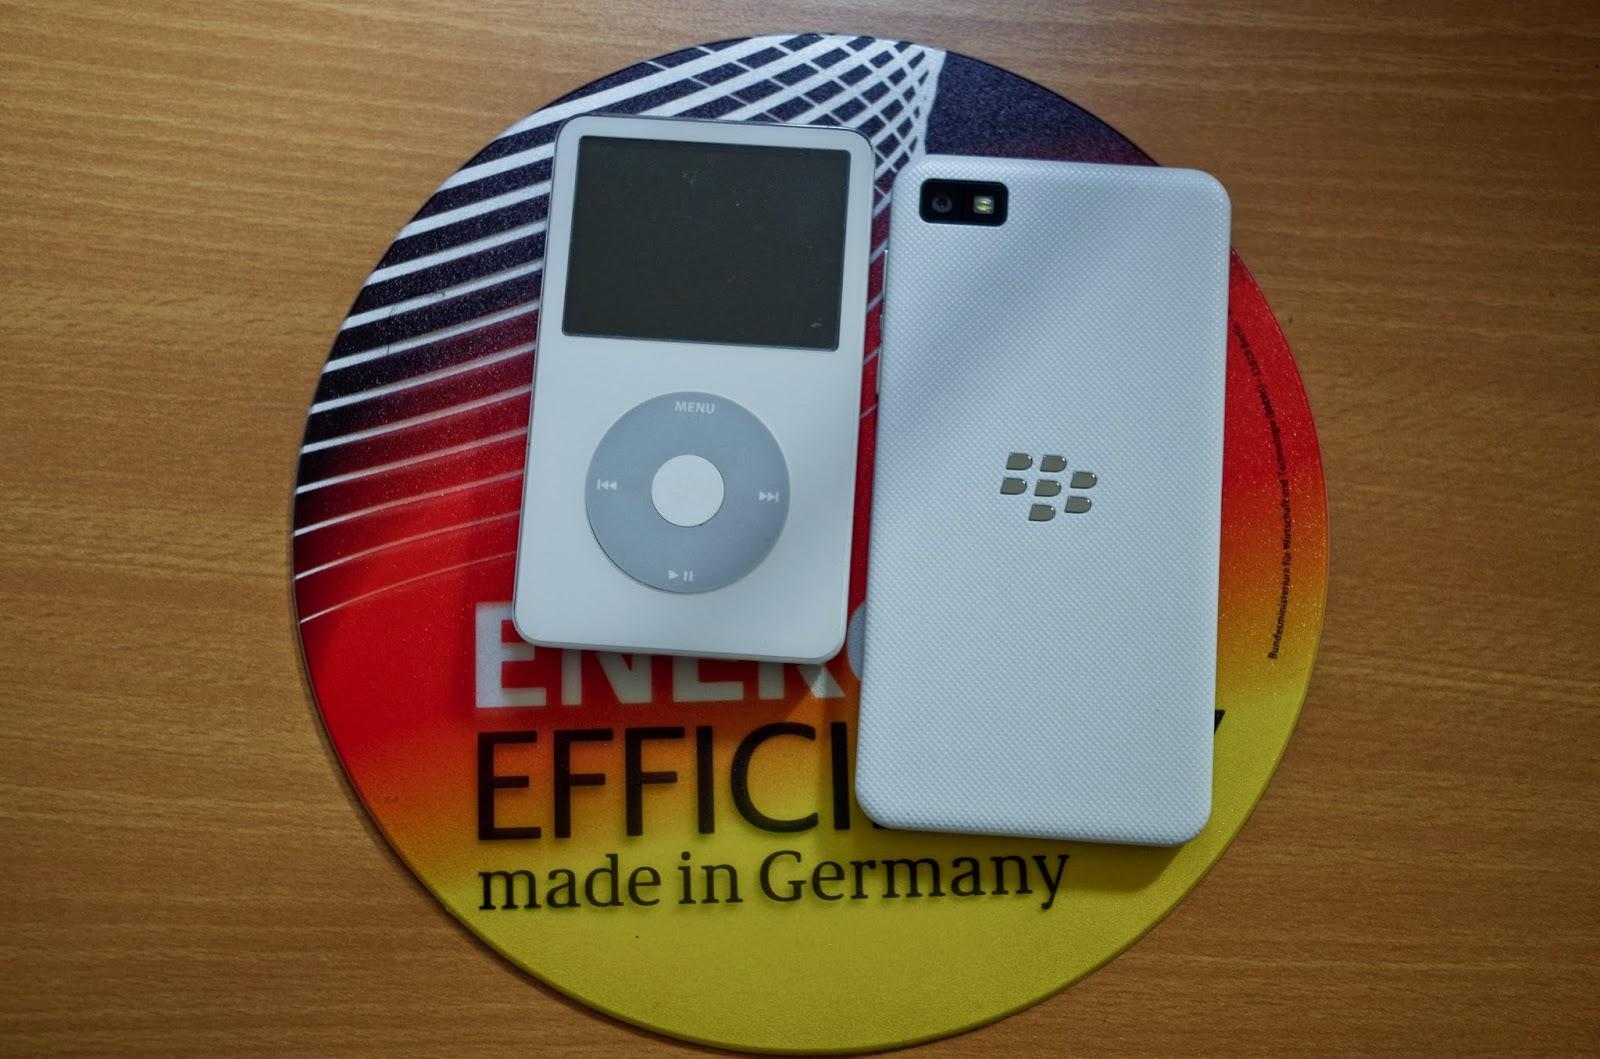 Blackberry Z10 The Savior